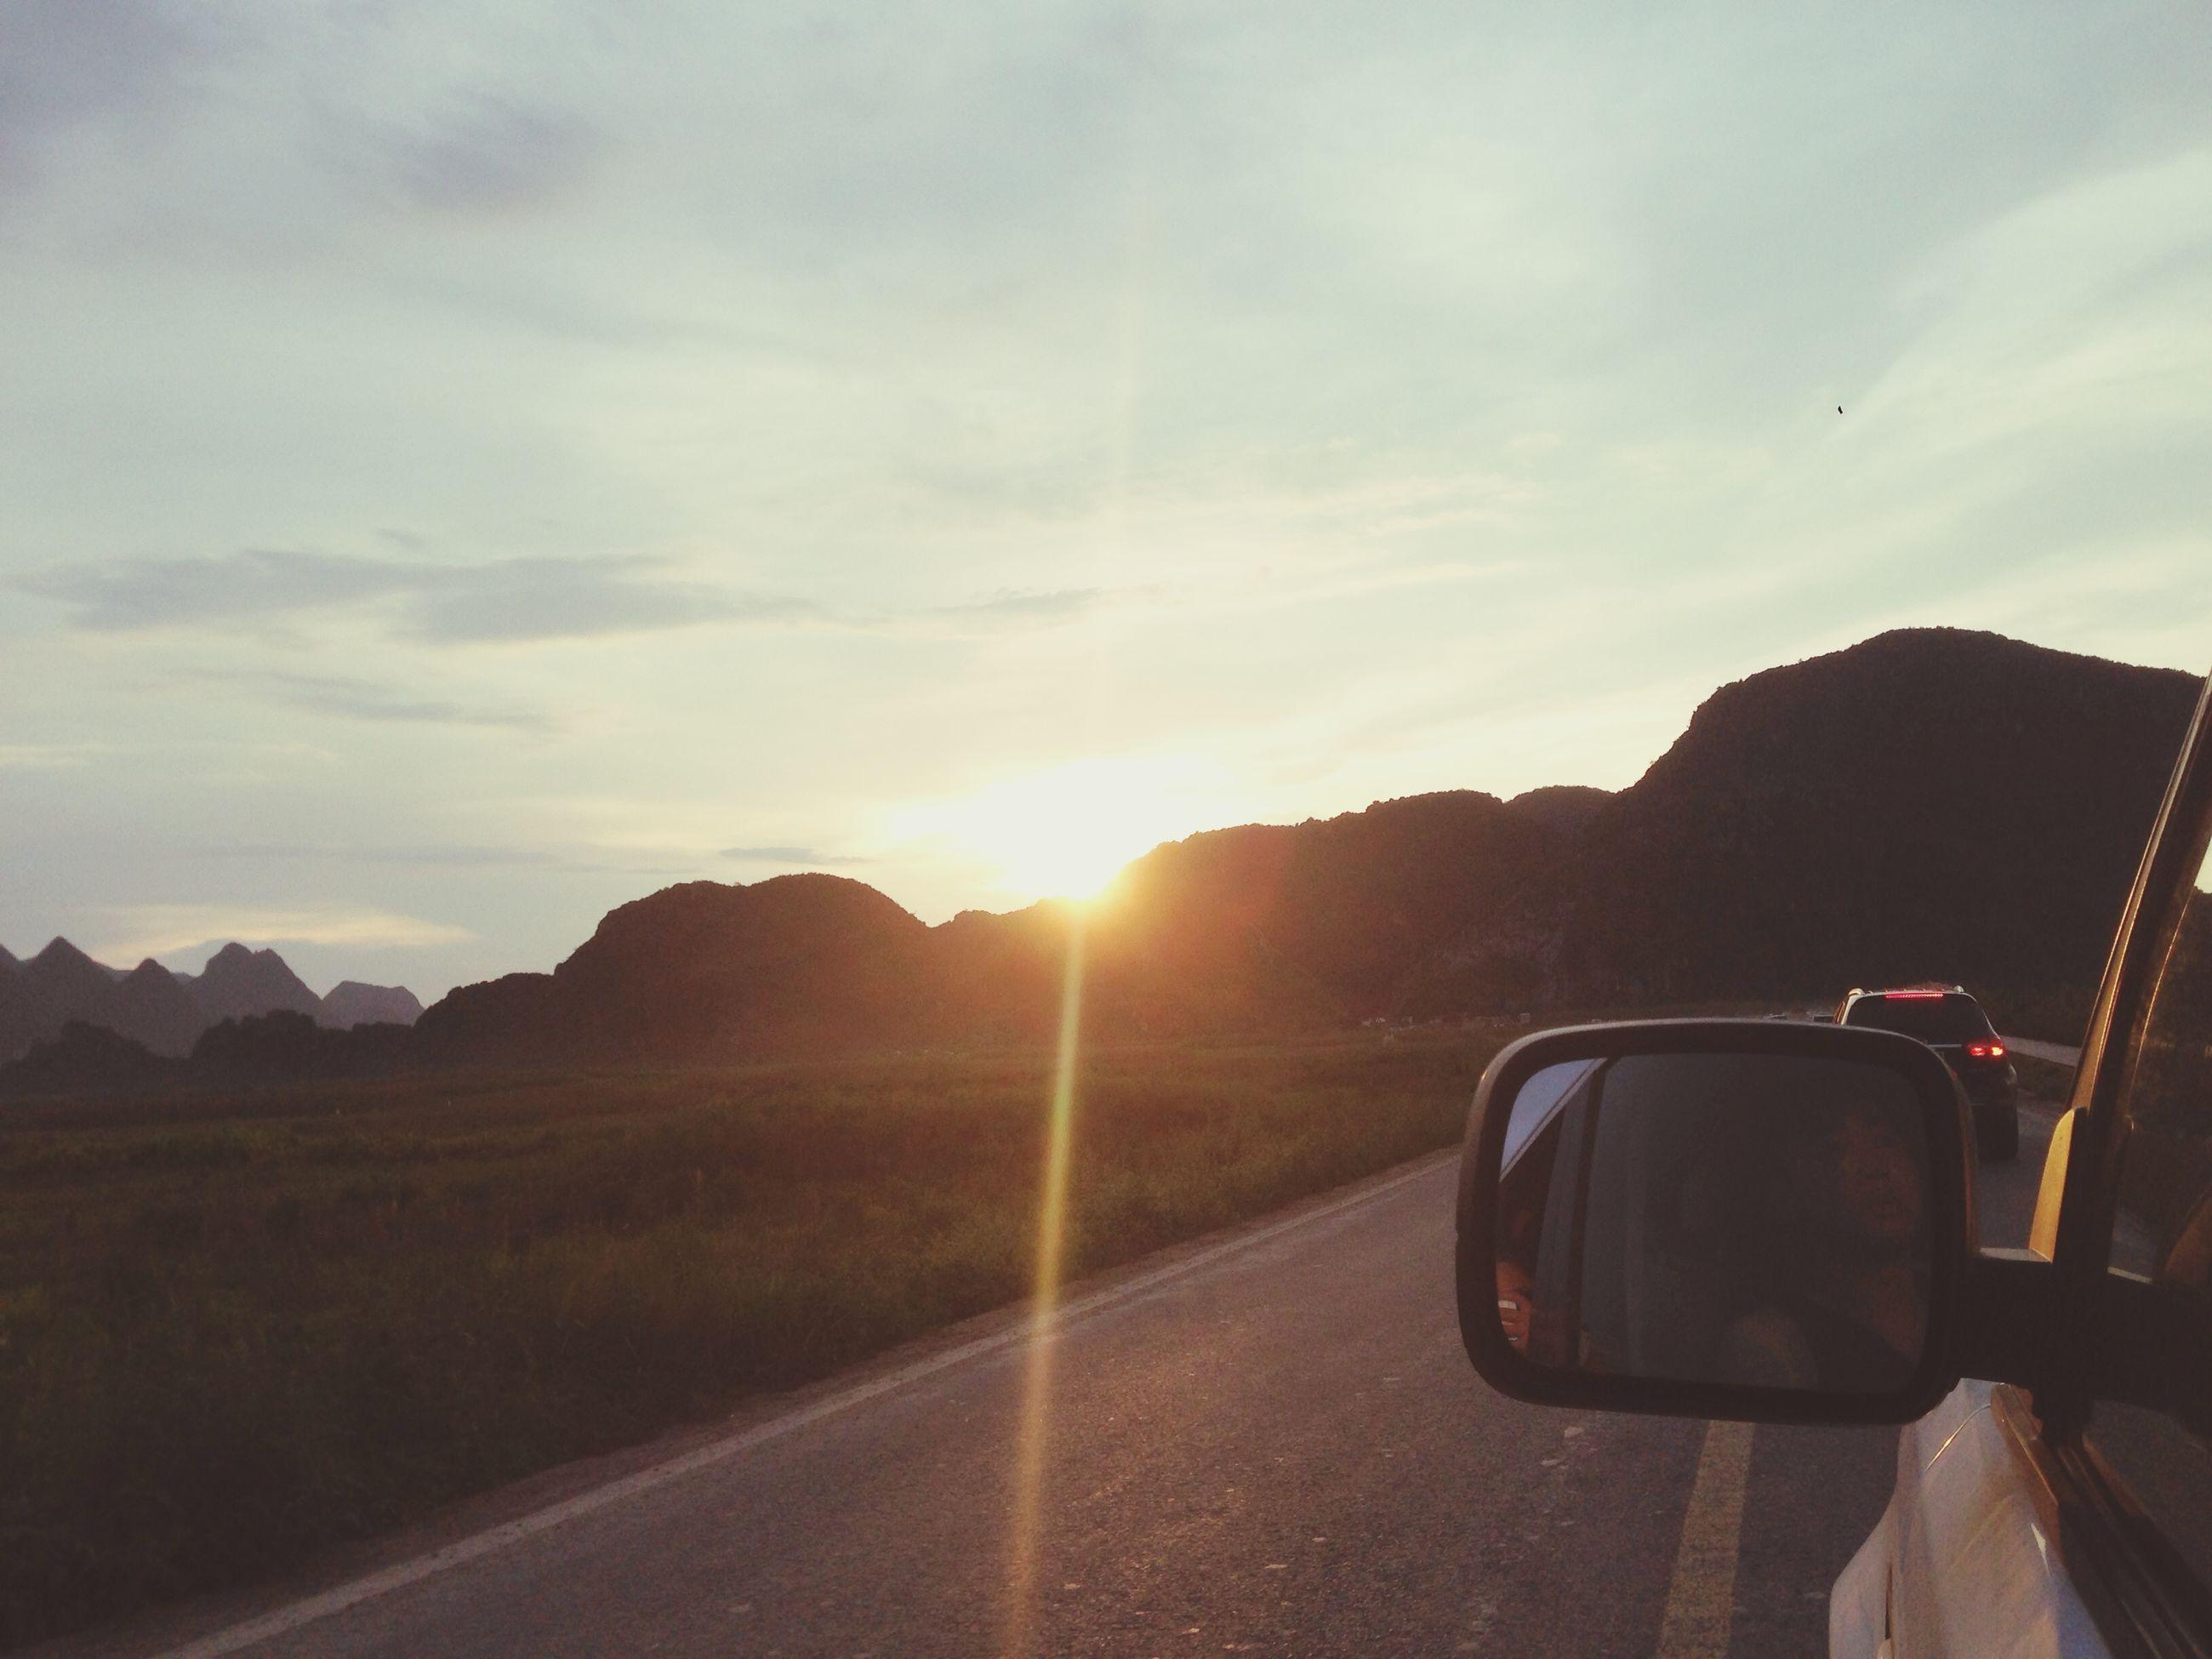 transportation, mountain, land vehicle, mode of transport, car, sun, sky, road, sunset, sunlight, mountain range, sunbeam, scenics, tranquil scene, beauty in nature, lens flare, landscape, tranquility, nature, cloud - sky